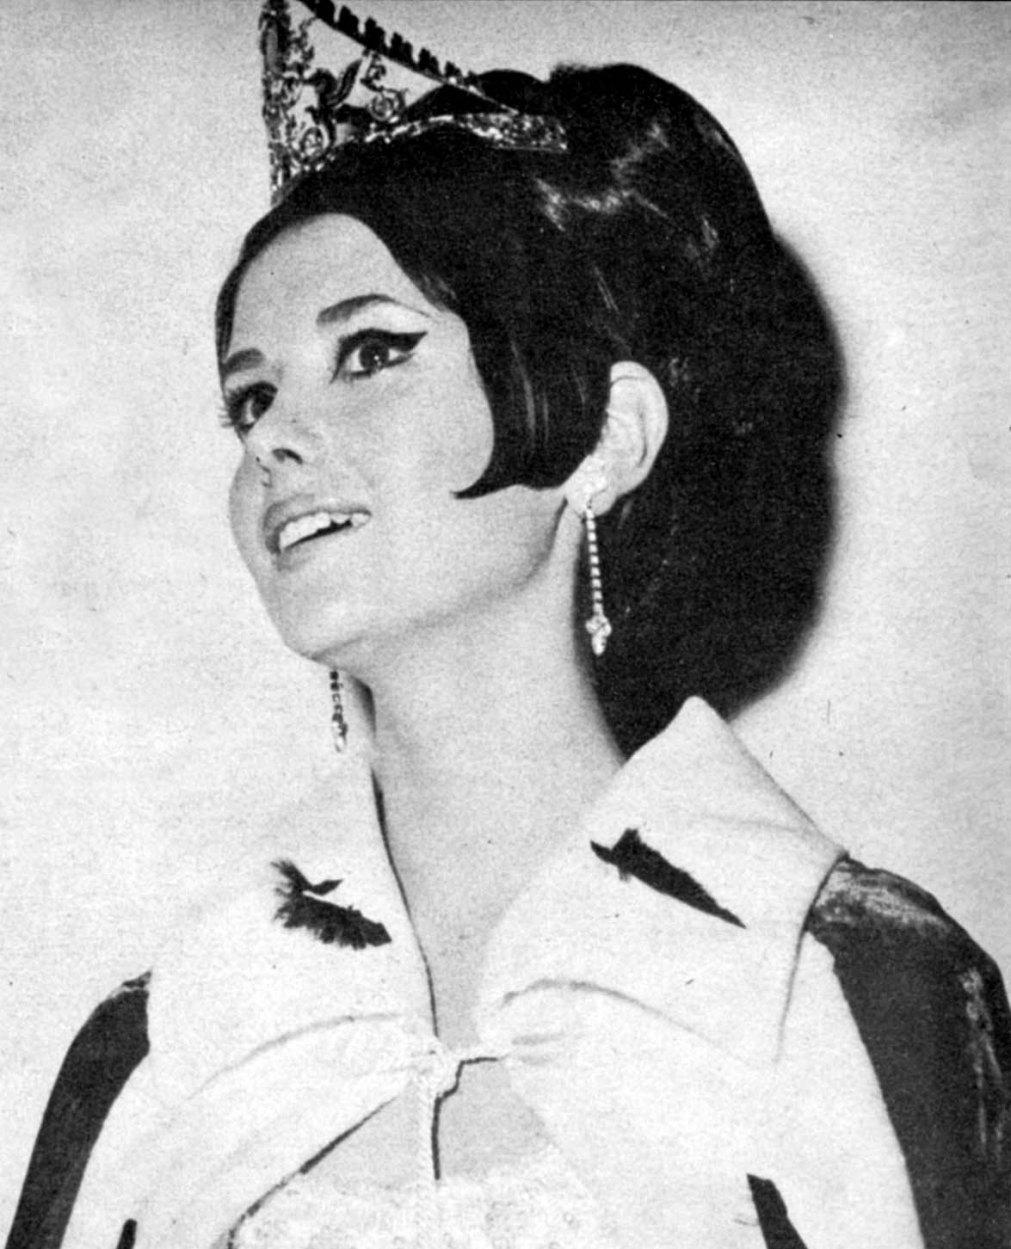 madeleine hartog-bell, primera peruana ser miss world. titulo de miss world 1967. semifinalista de miss universe 1966. Tumblr_o2bh6simoz1ttv0wmo1_1280